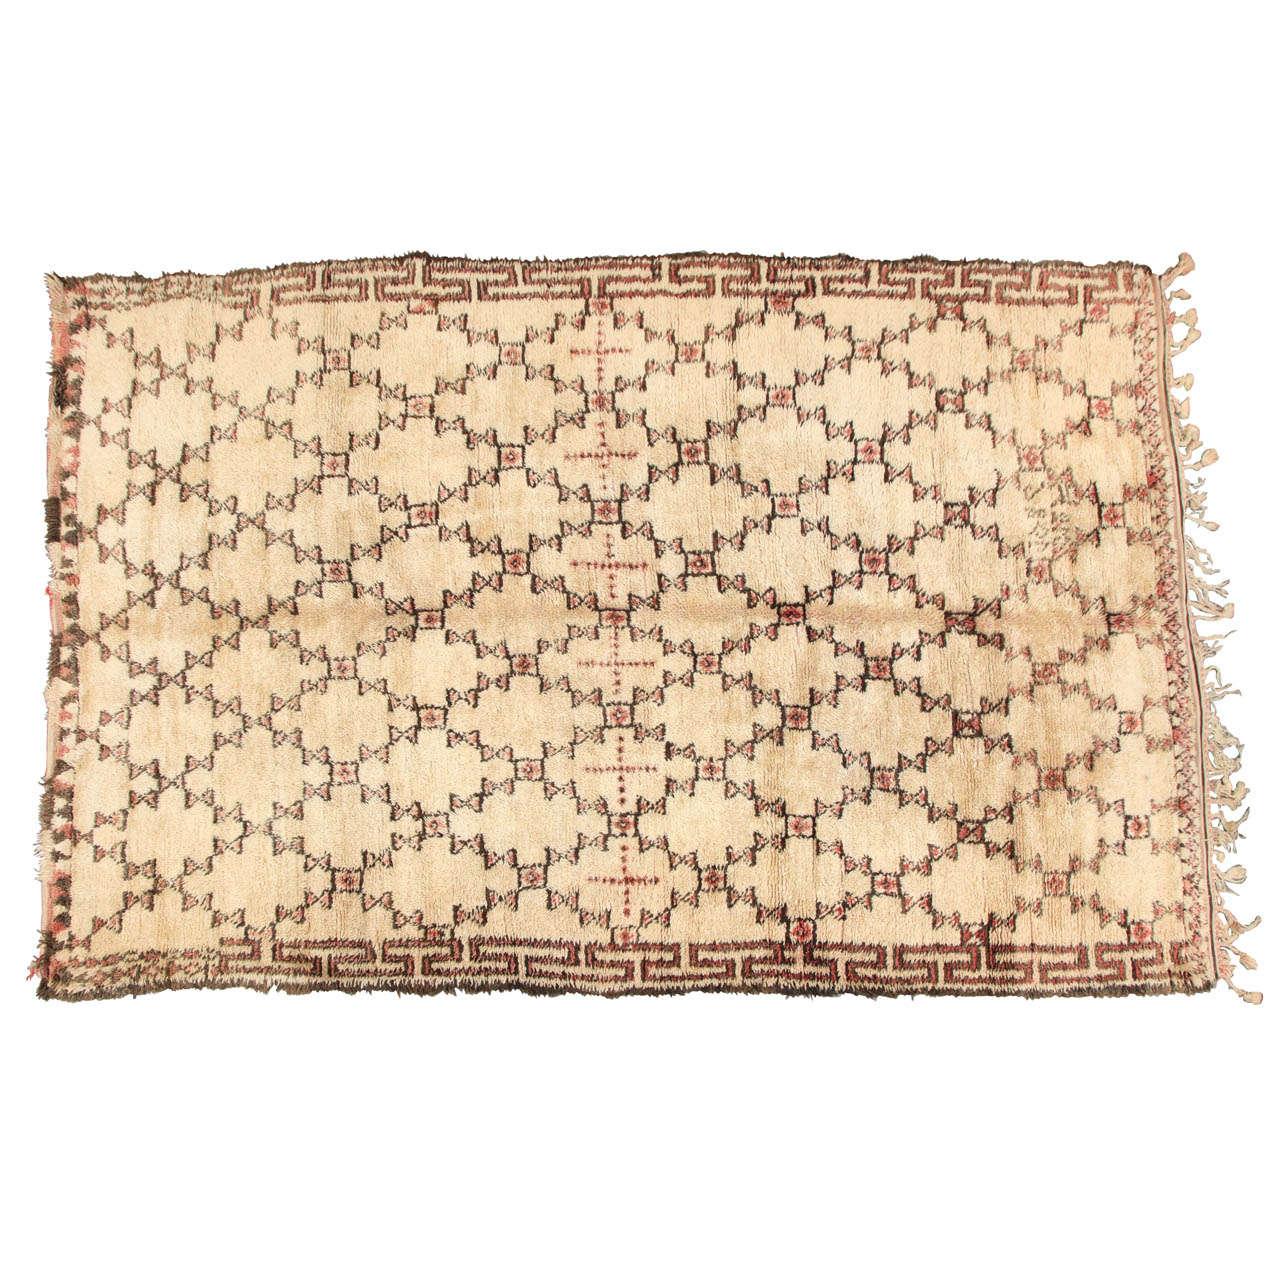 beni ourain moroccan rug at 1stdibs. Black Bedroom Furniture Sets. Home Design Ideas